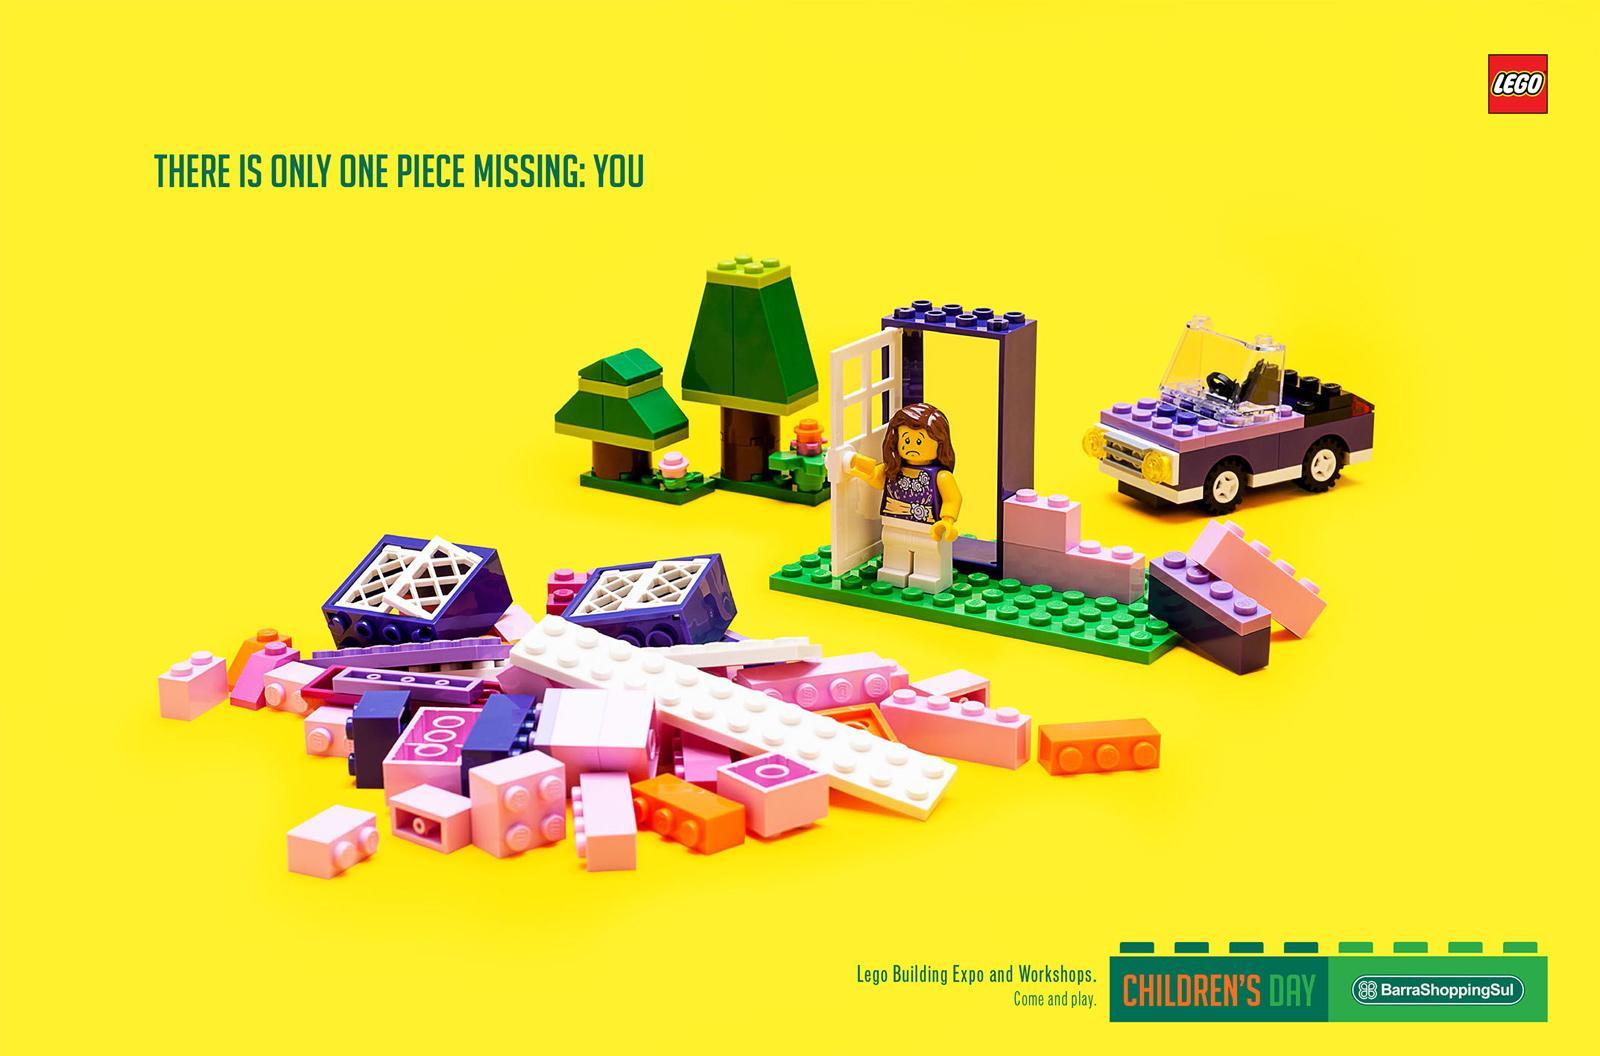 BarraShoppingSul Print Ad -  One piece missing, Girl